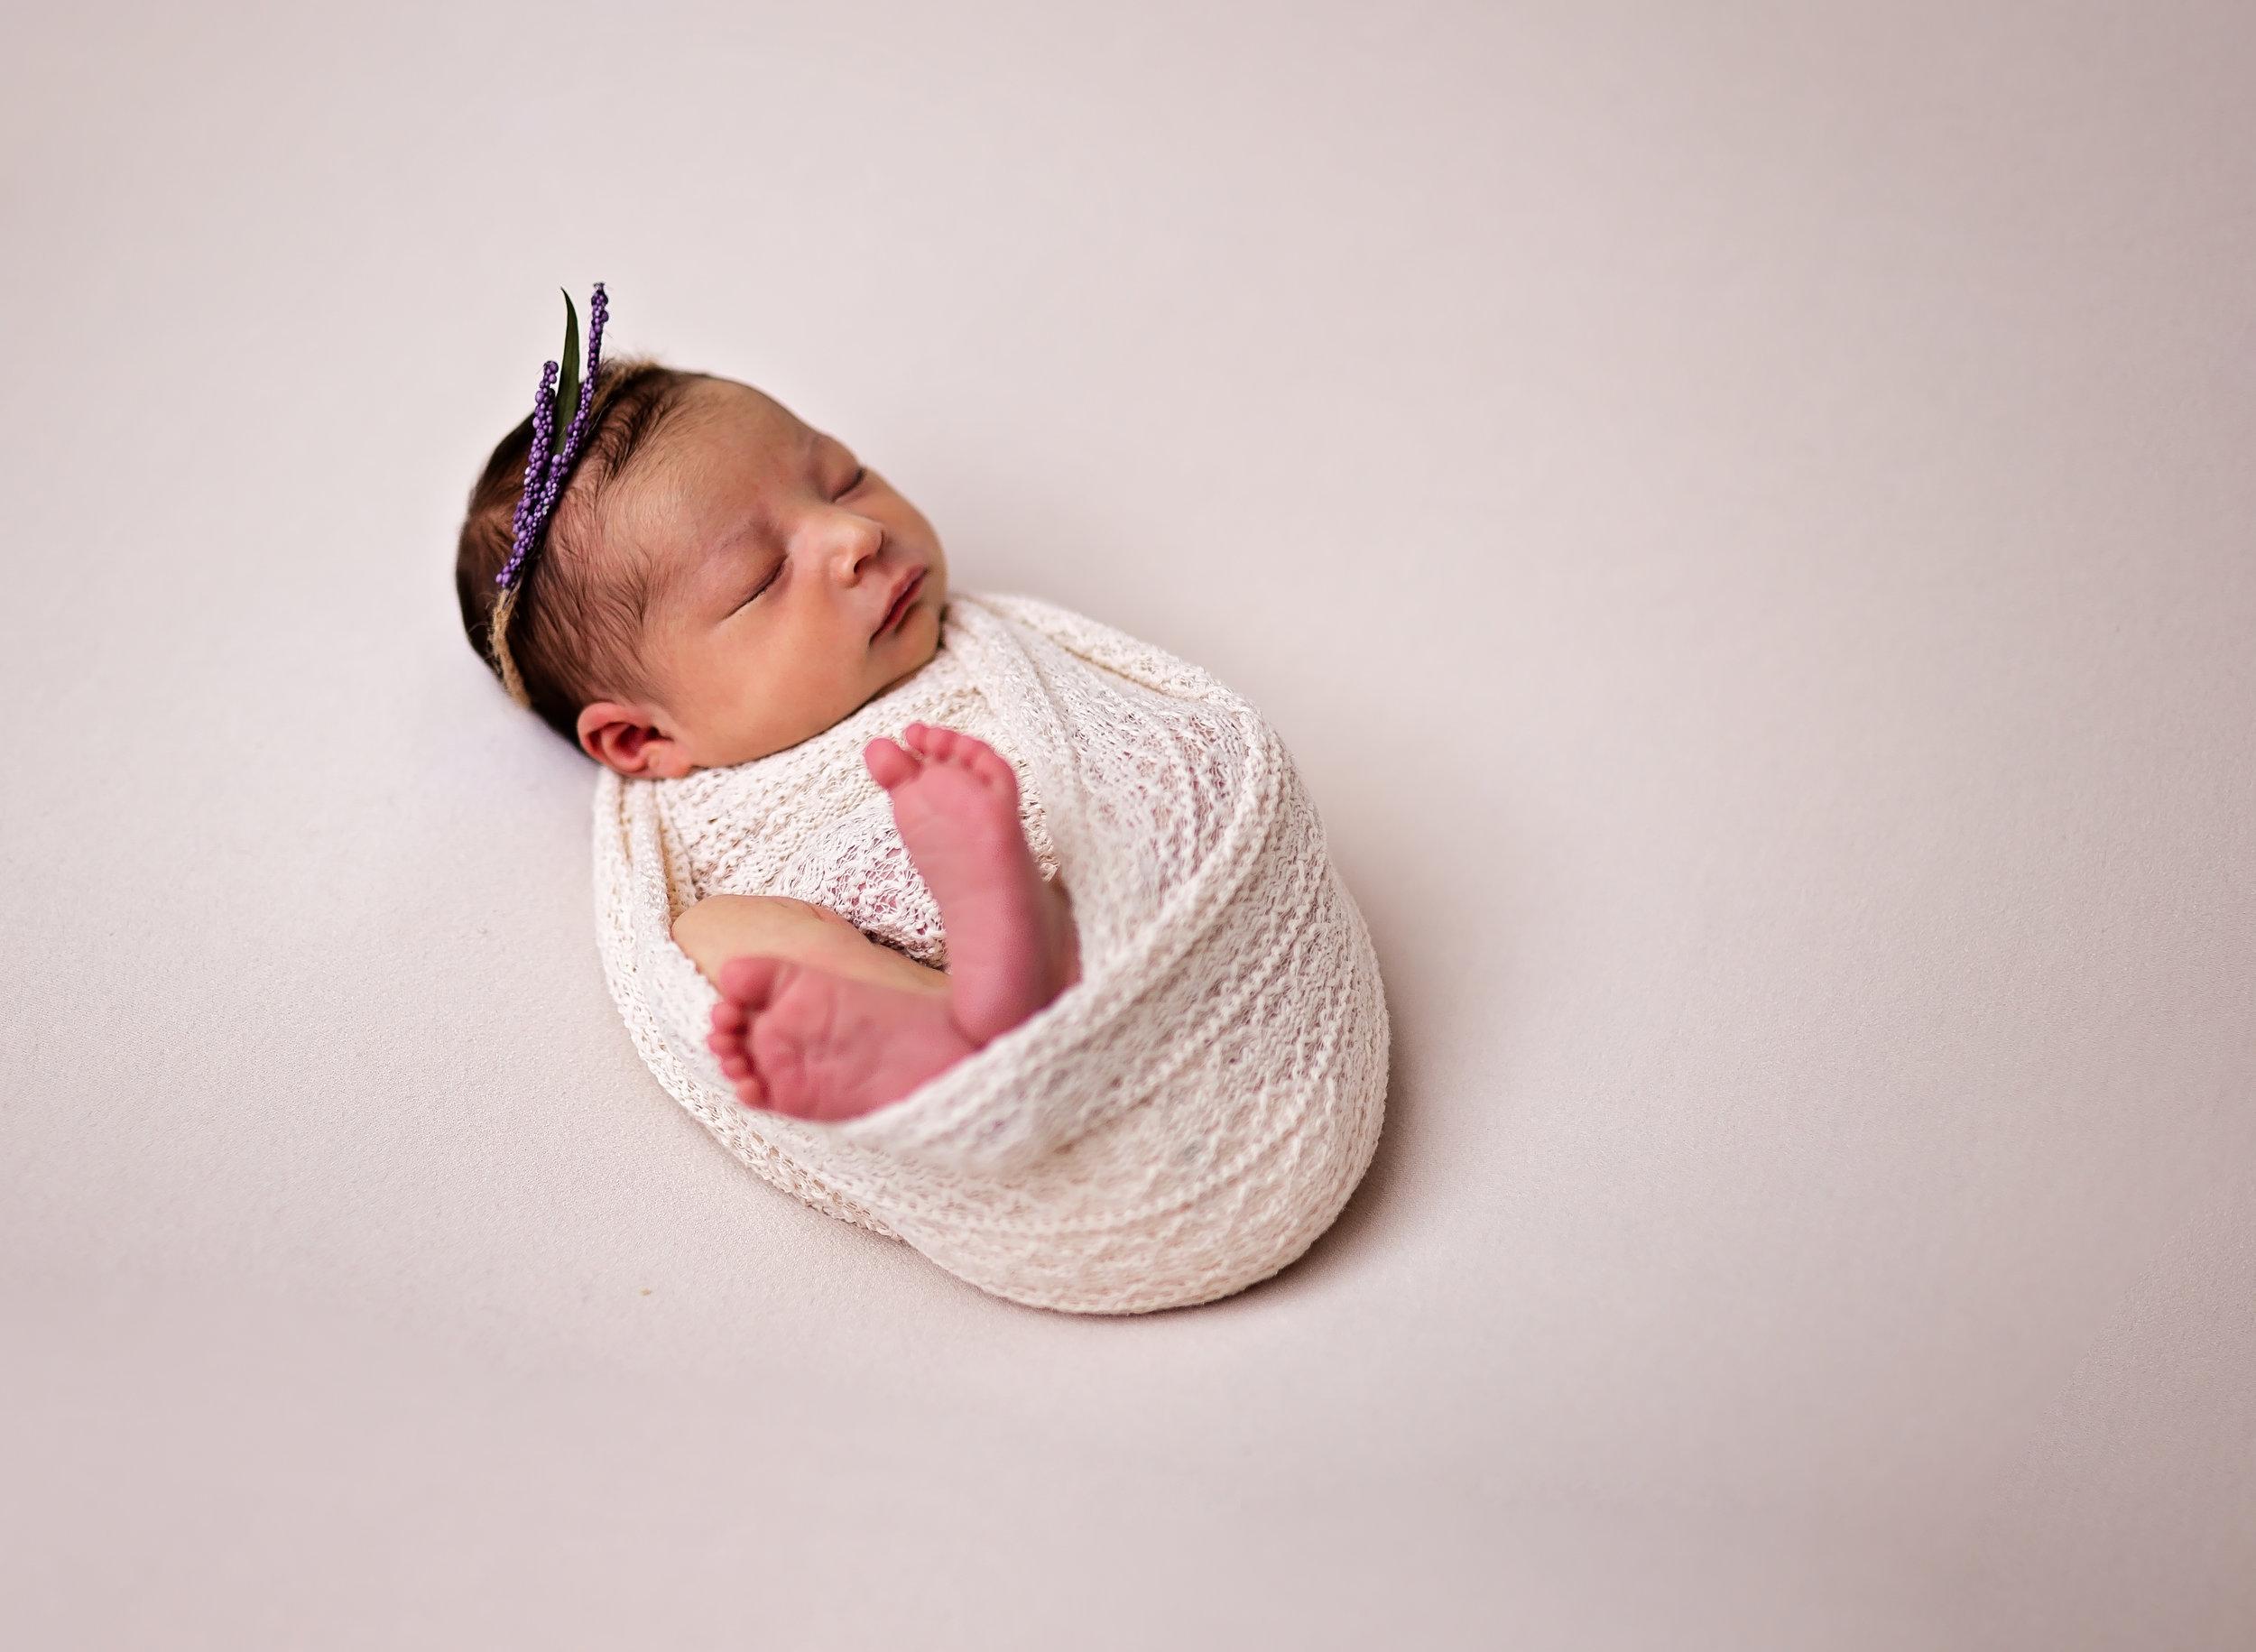 fort leonard wood newborn photography baby on cream fabric